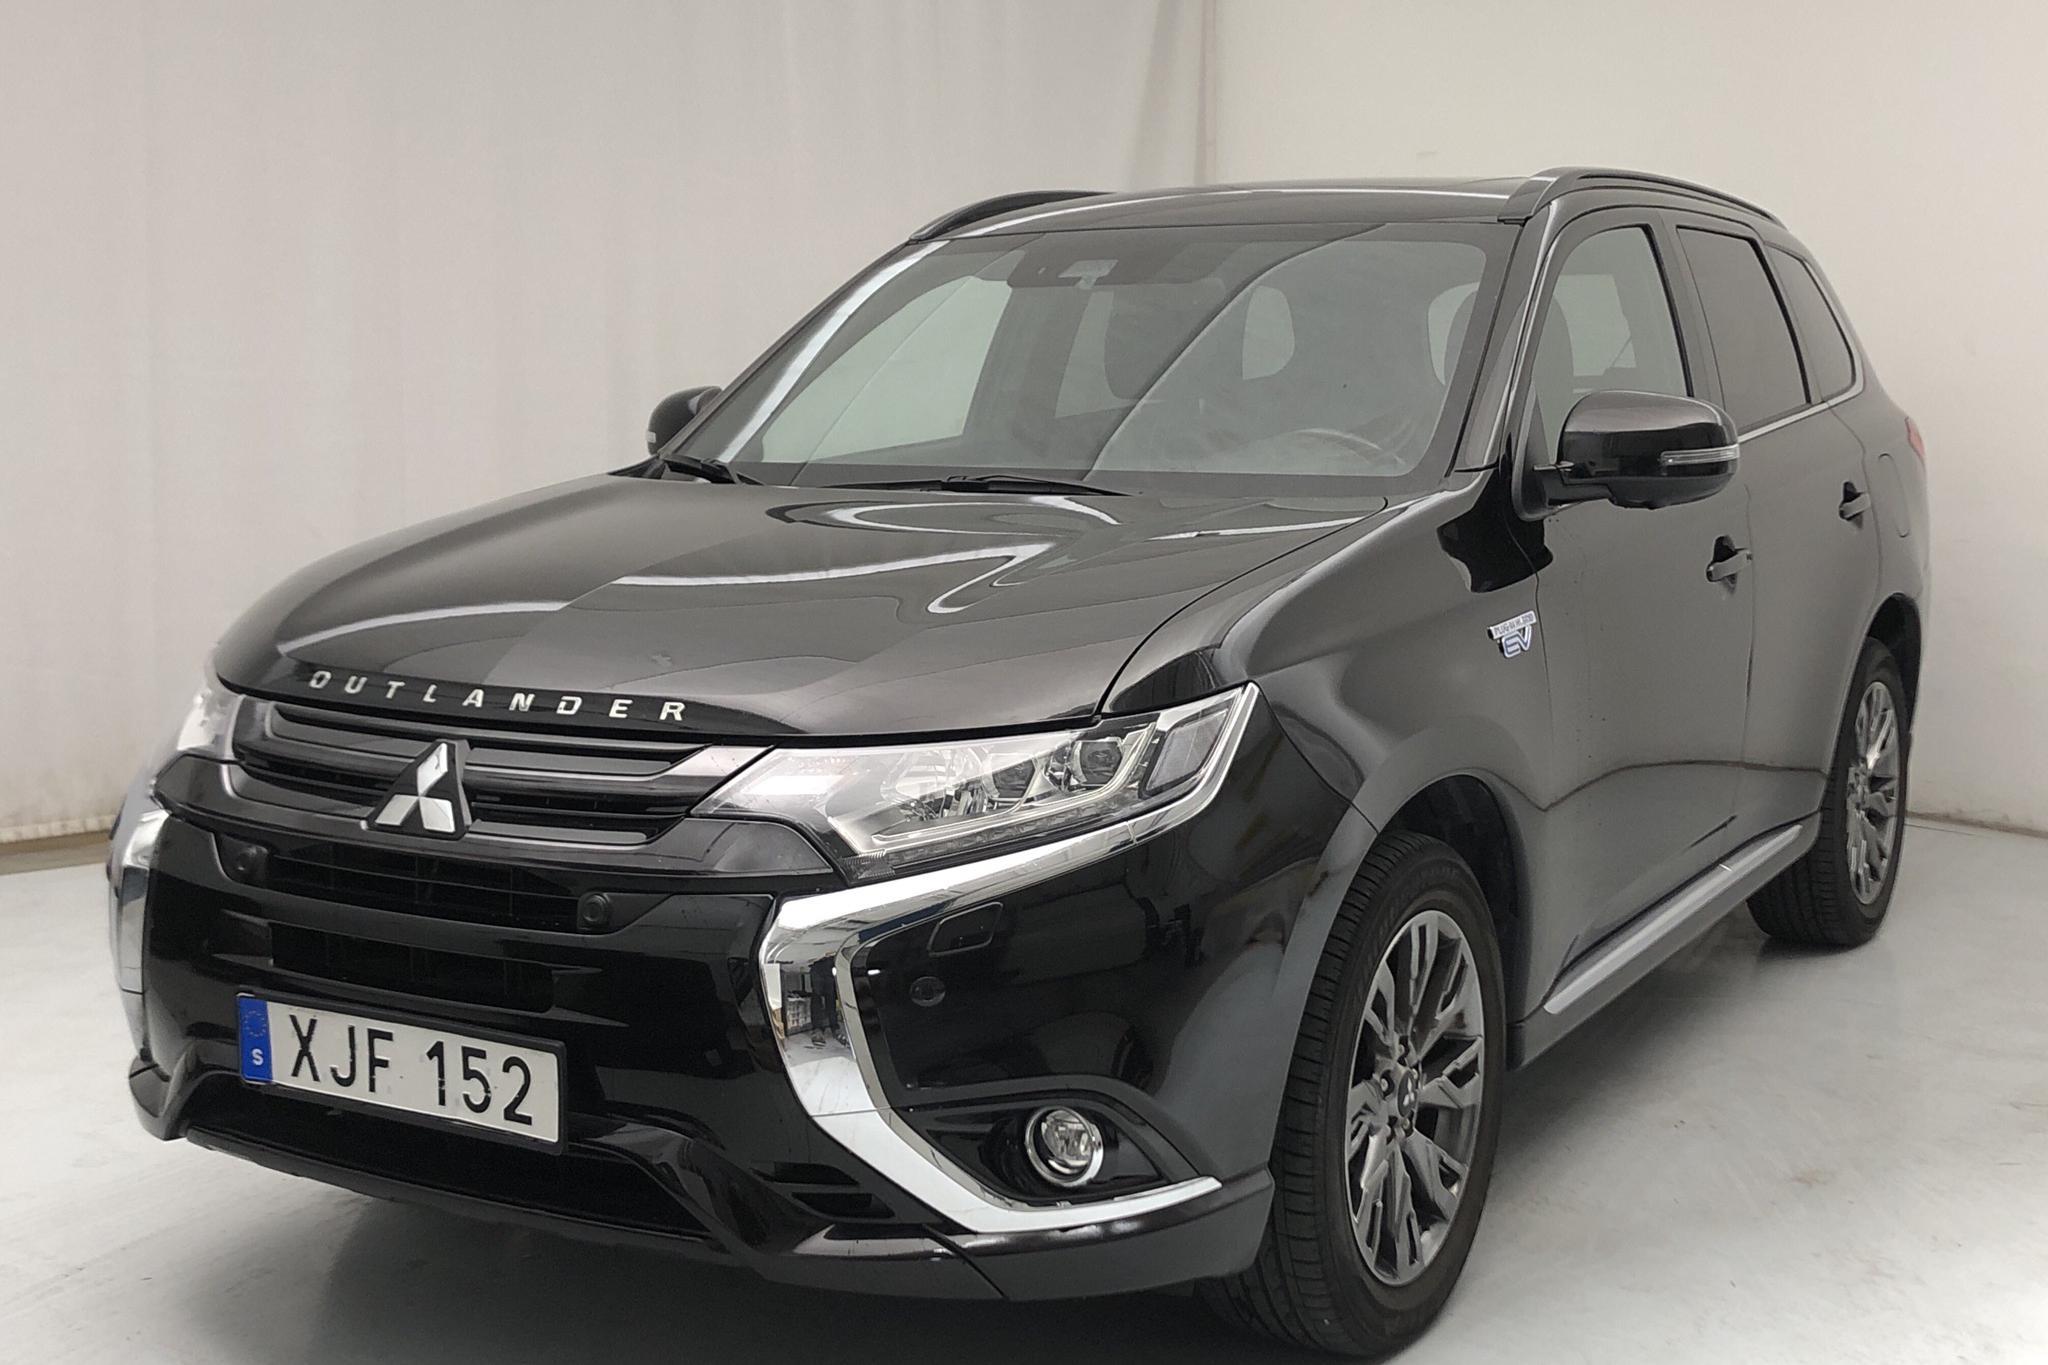 Mitsubishi Outlander 2.0 Plug-in Hybrid 4WD (121hk) - 36 120 km - Automatic - black - 2018